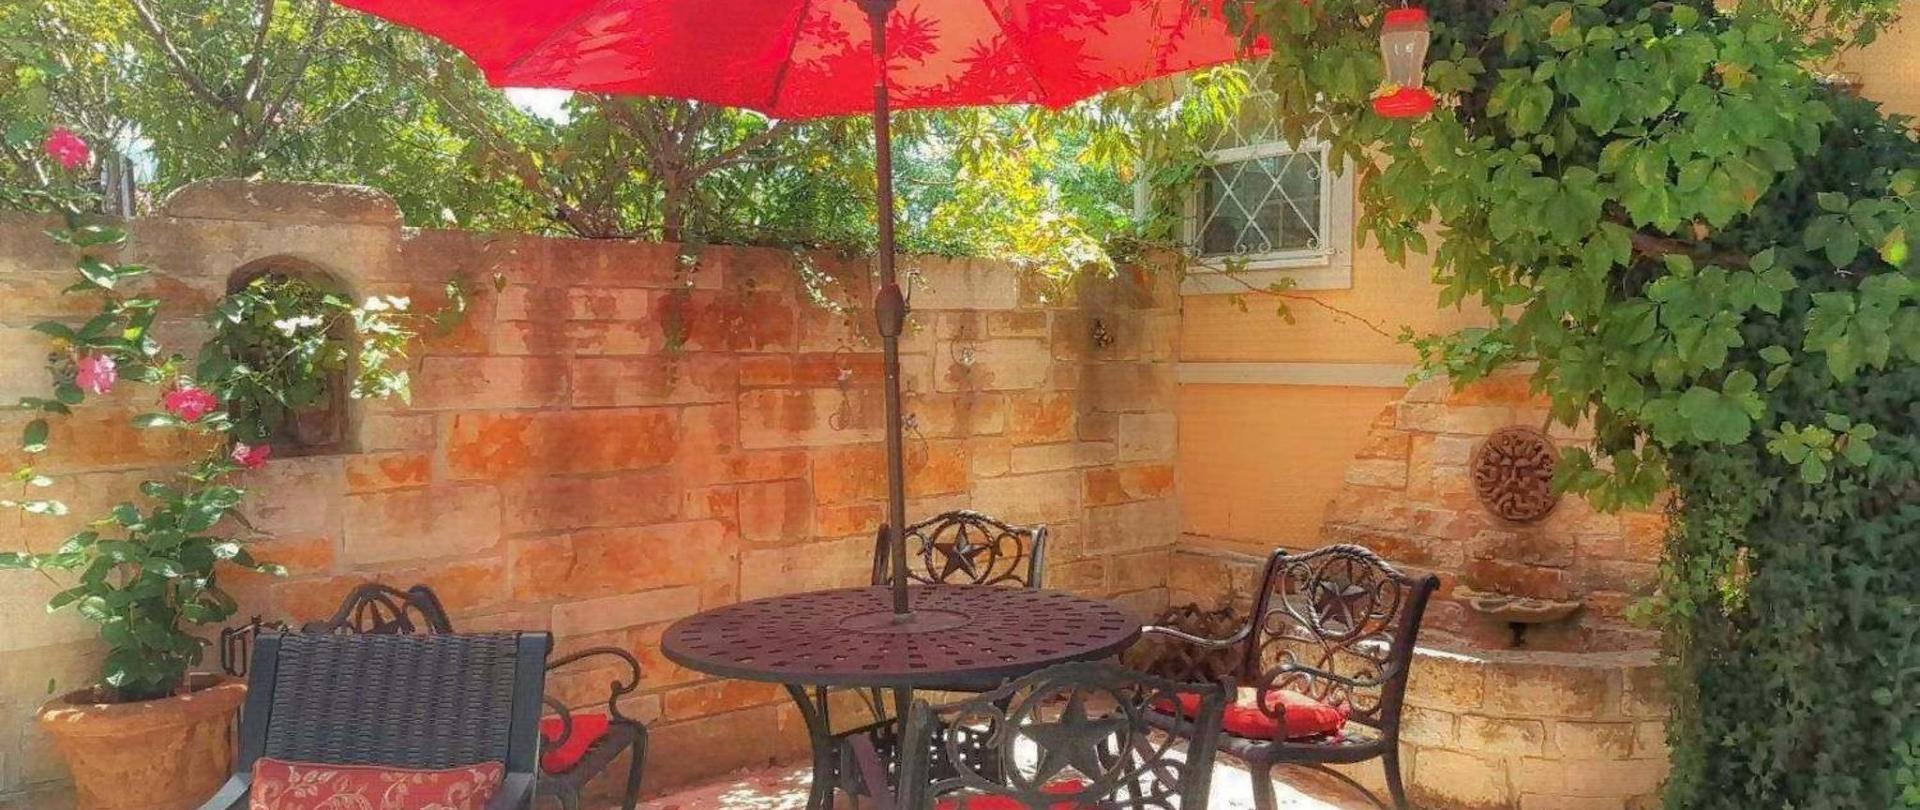 patio_06-1.jpg